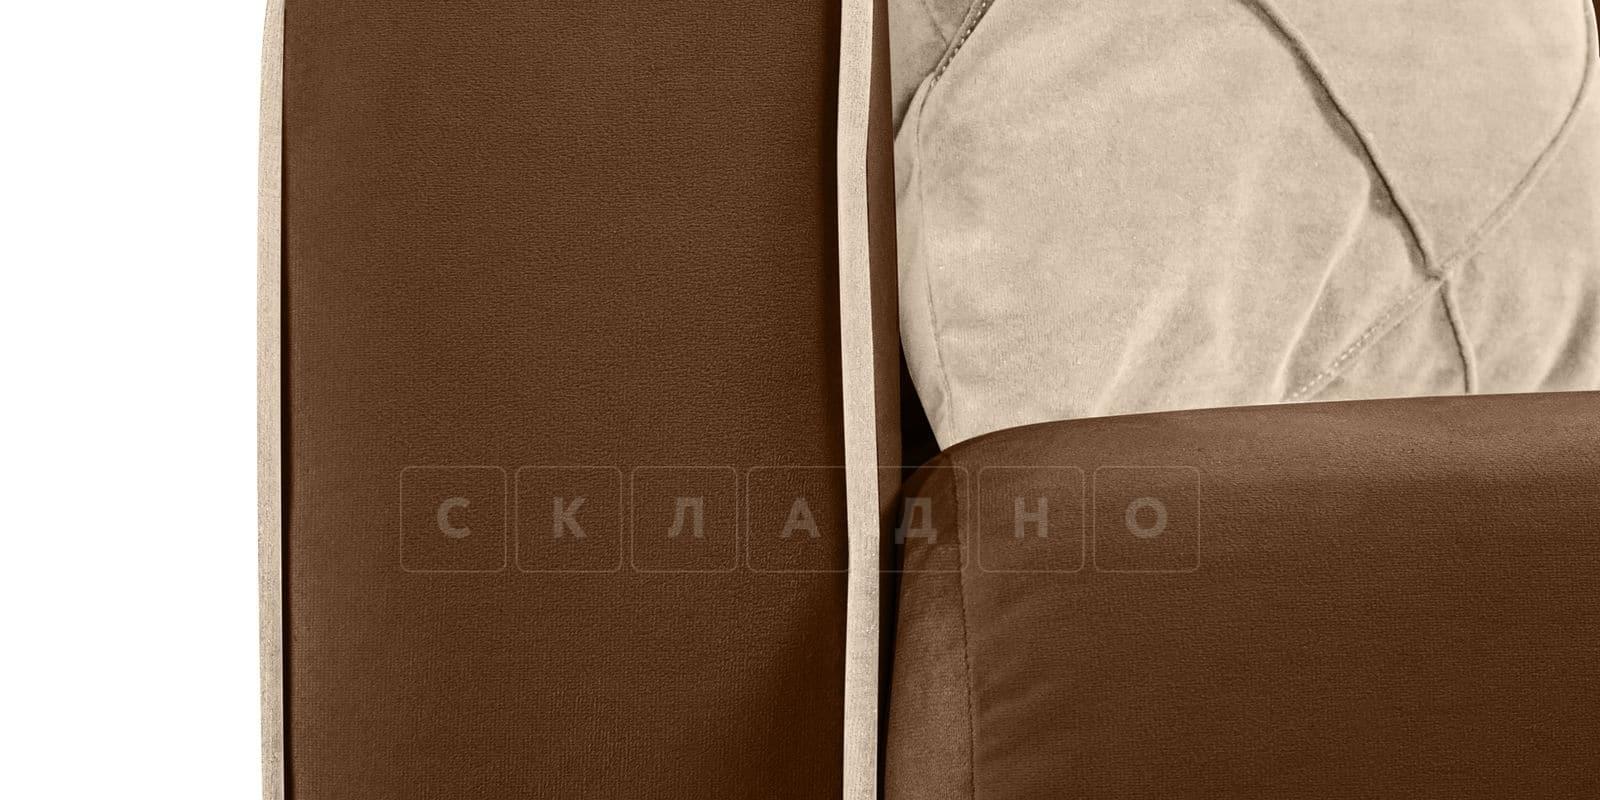 Диван Флэтфорд велюр коричневый фото 6 | интернет-магазин Складно